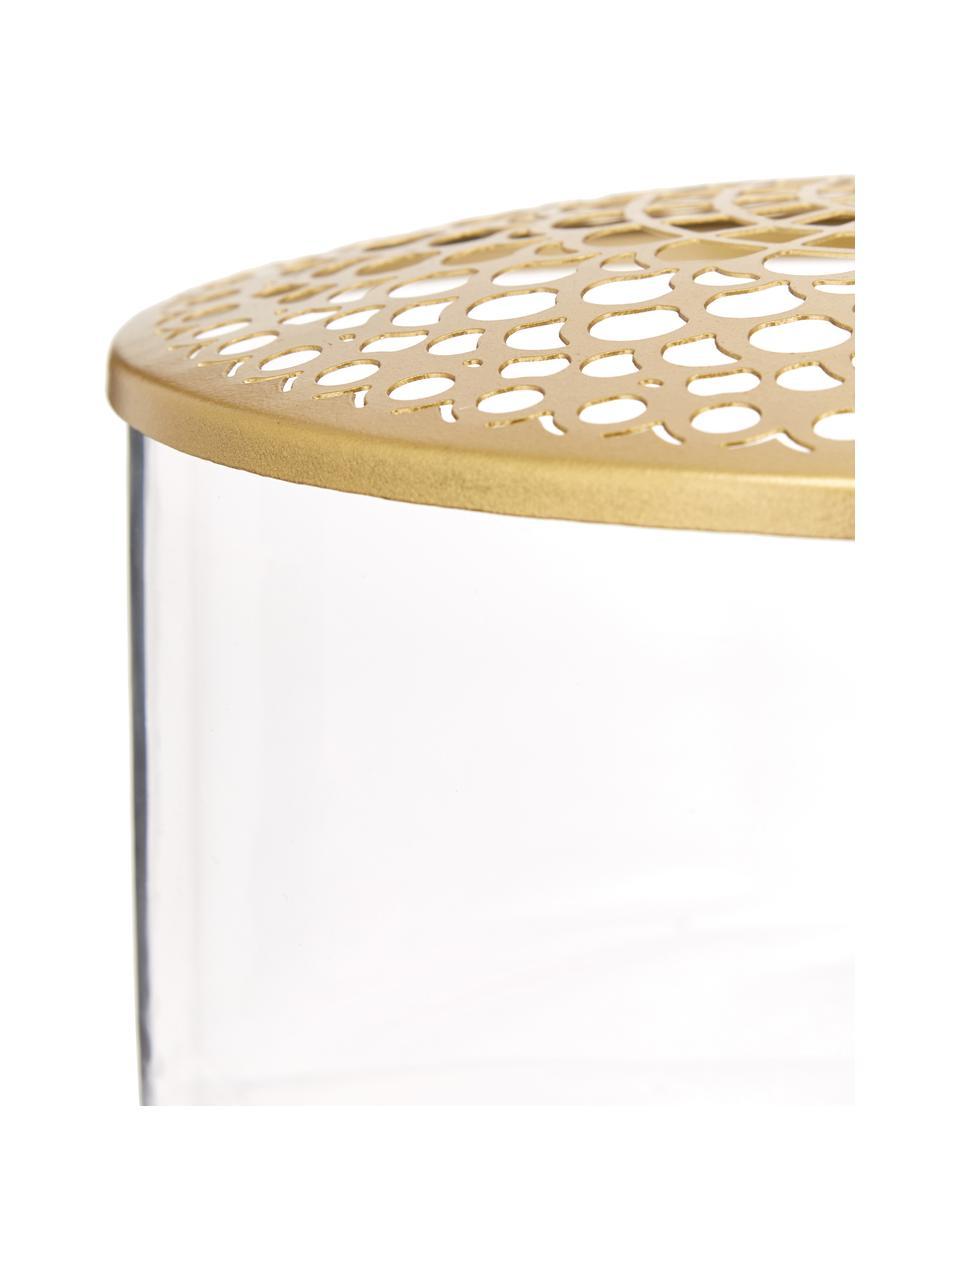 Jarrón pequeño de vidrio Kassandra, Jarrón: vidrio, Jarrón: transparente Tapa: latón, Ø 21 x Al 10 cm